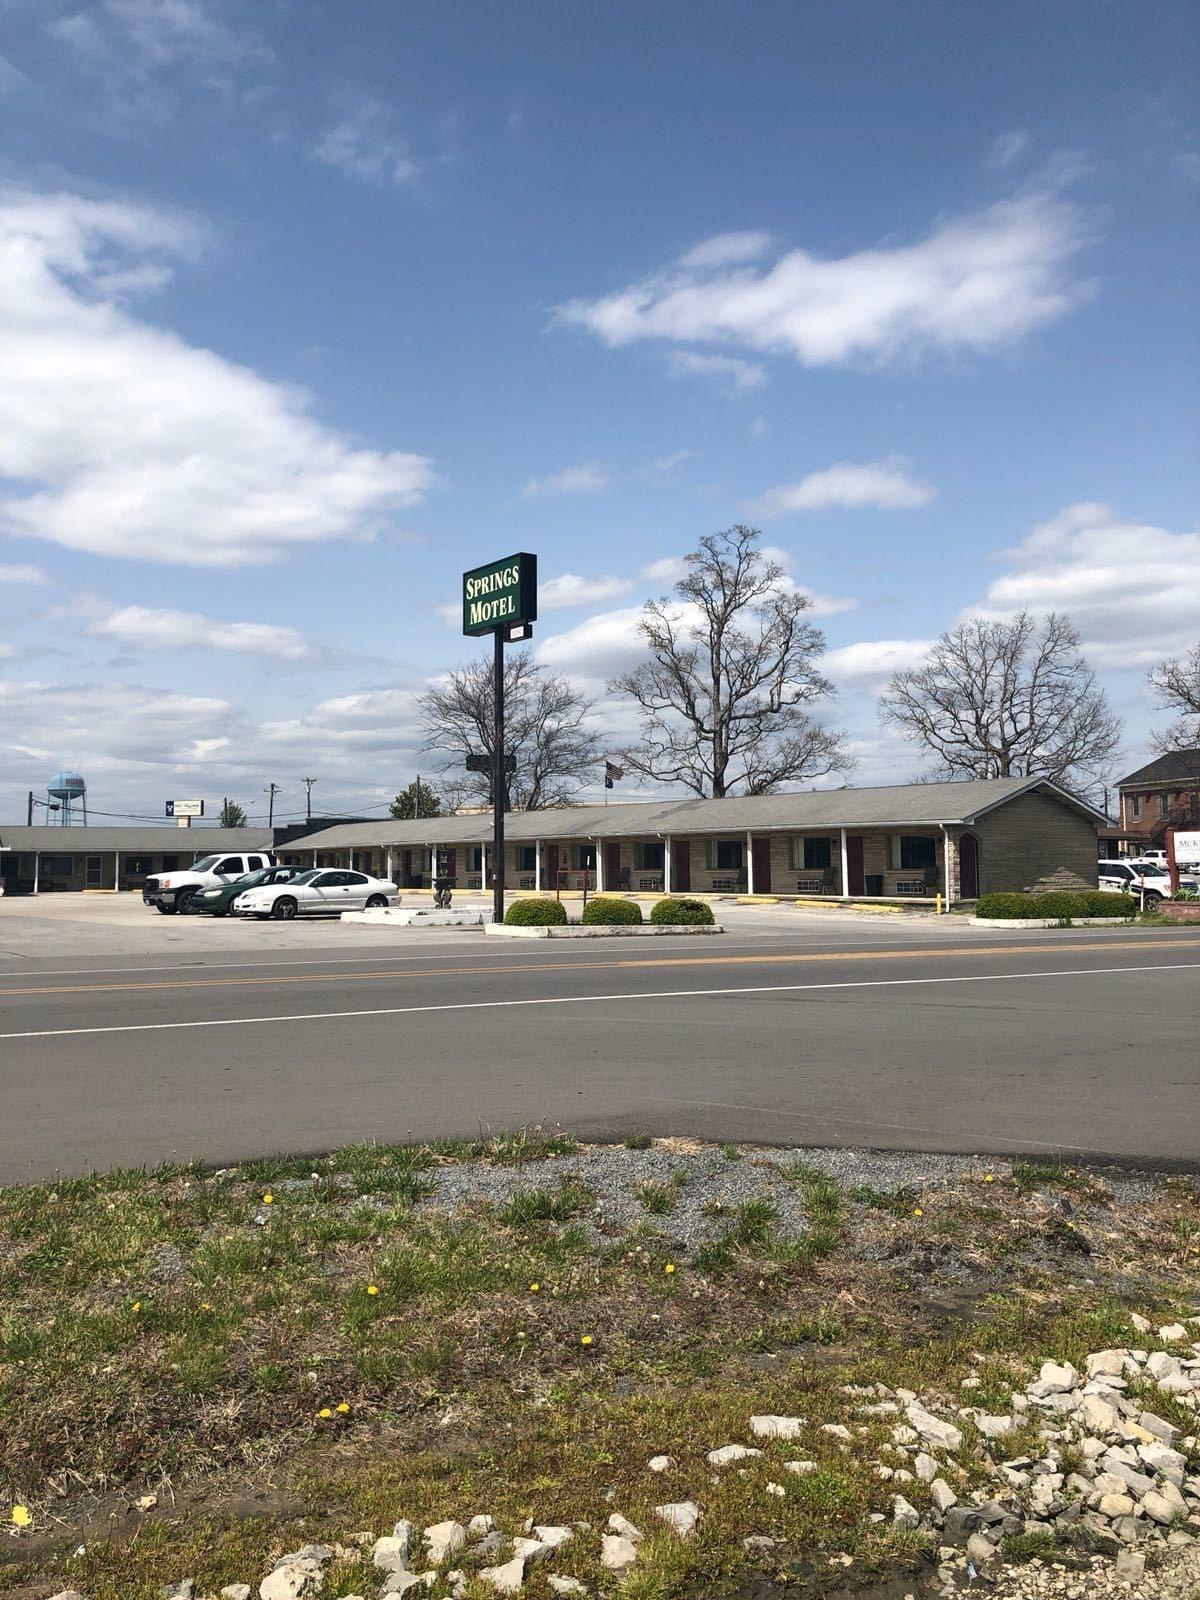 Springs Motel, Russell